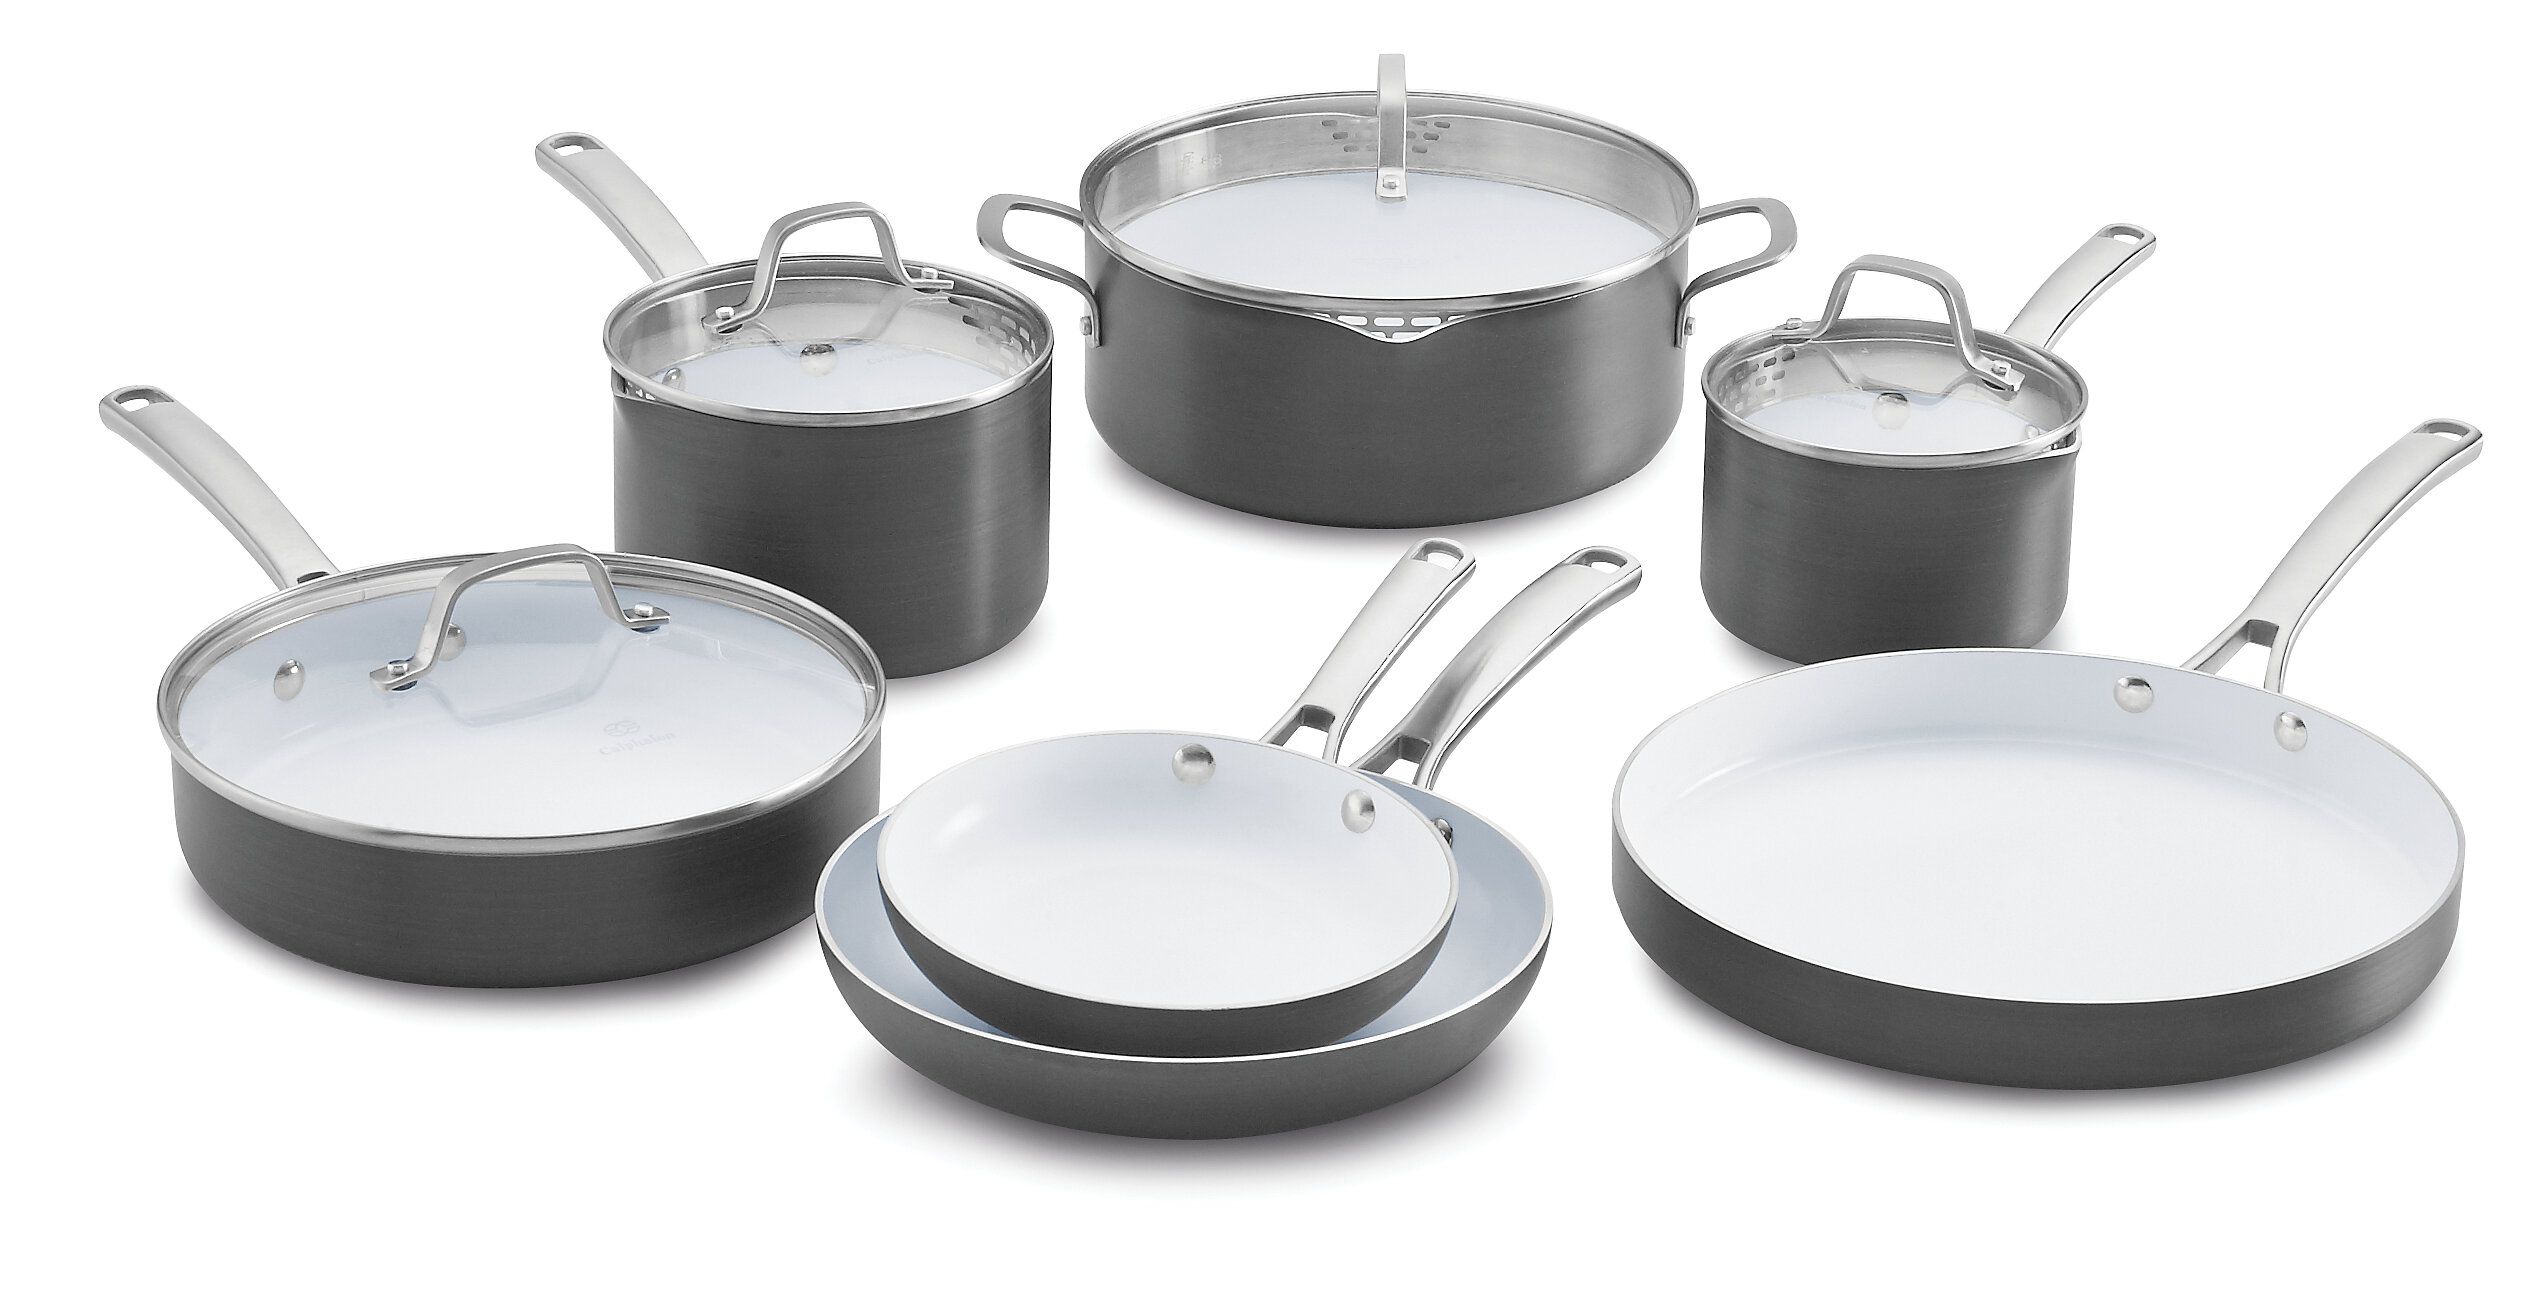 Calphalon Classic Ceramic 11 Piece Non-Stick Cookware Set & Reviews ...